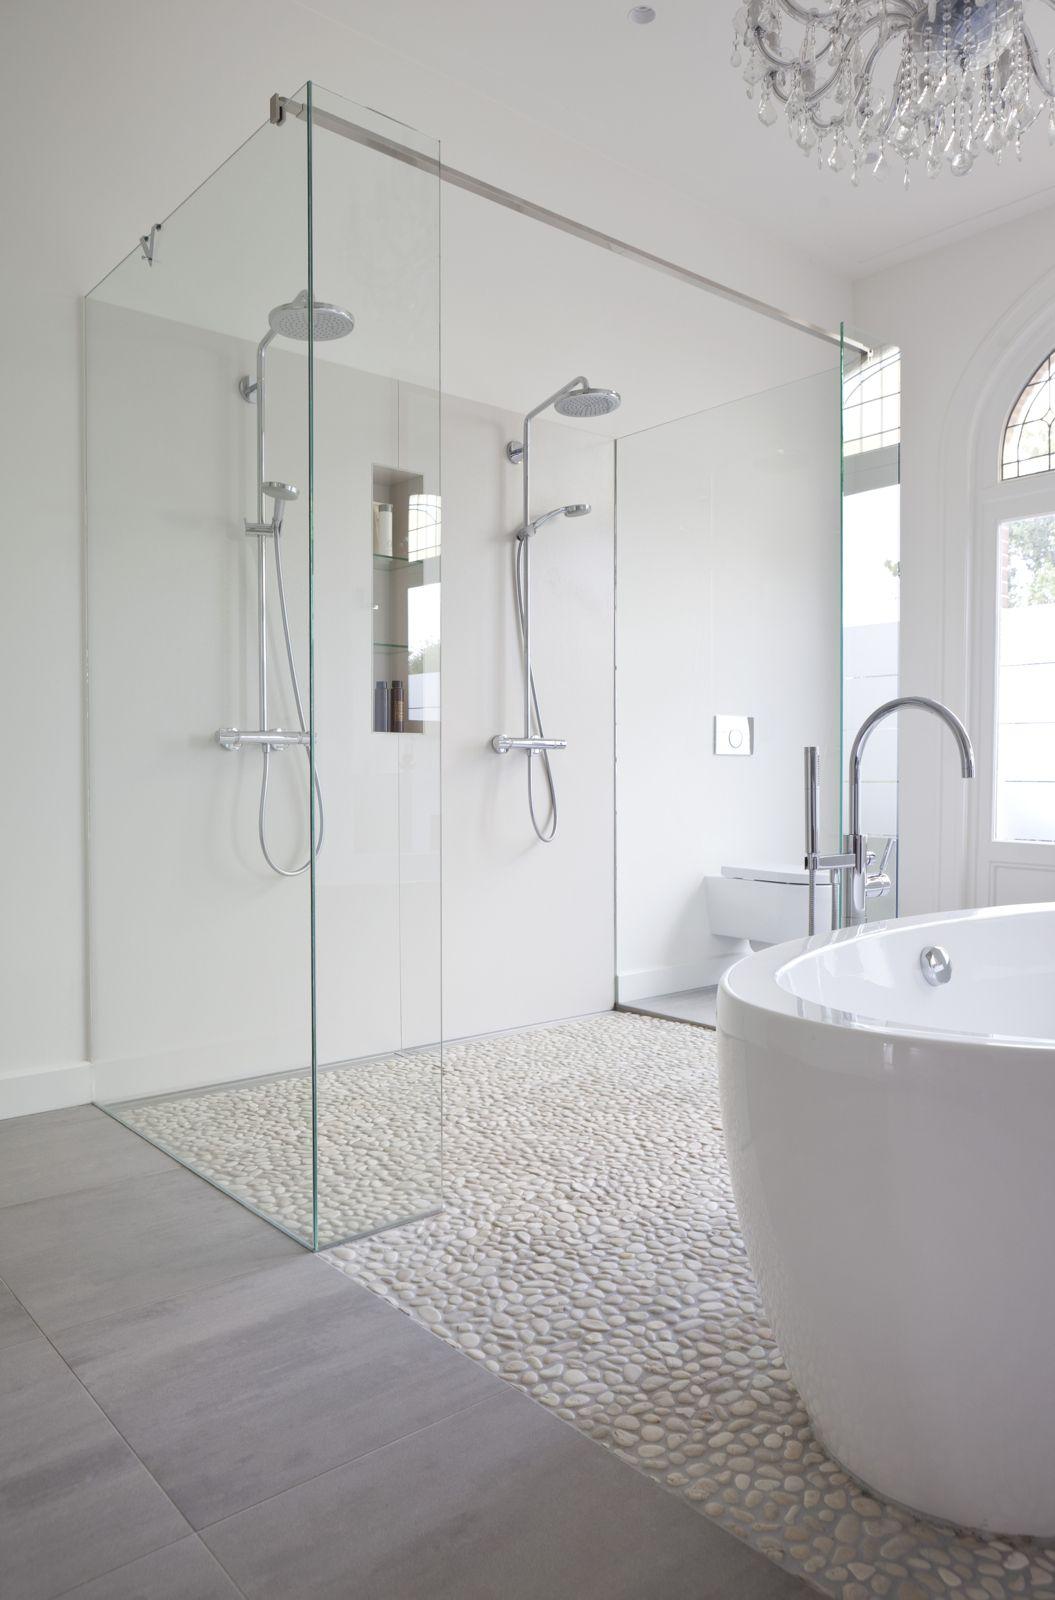 White Pebble Tile | Interior | Pinterest | White pebbles, Pebble ...